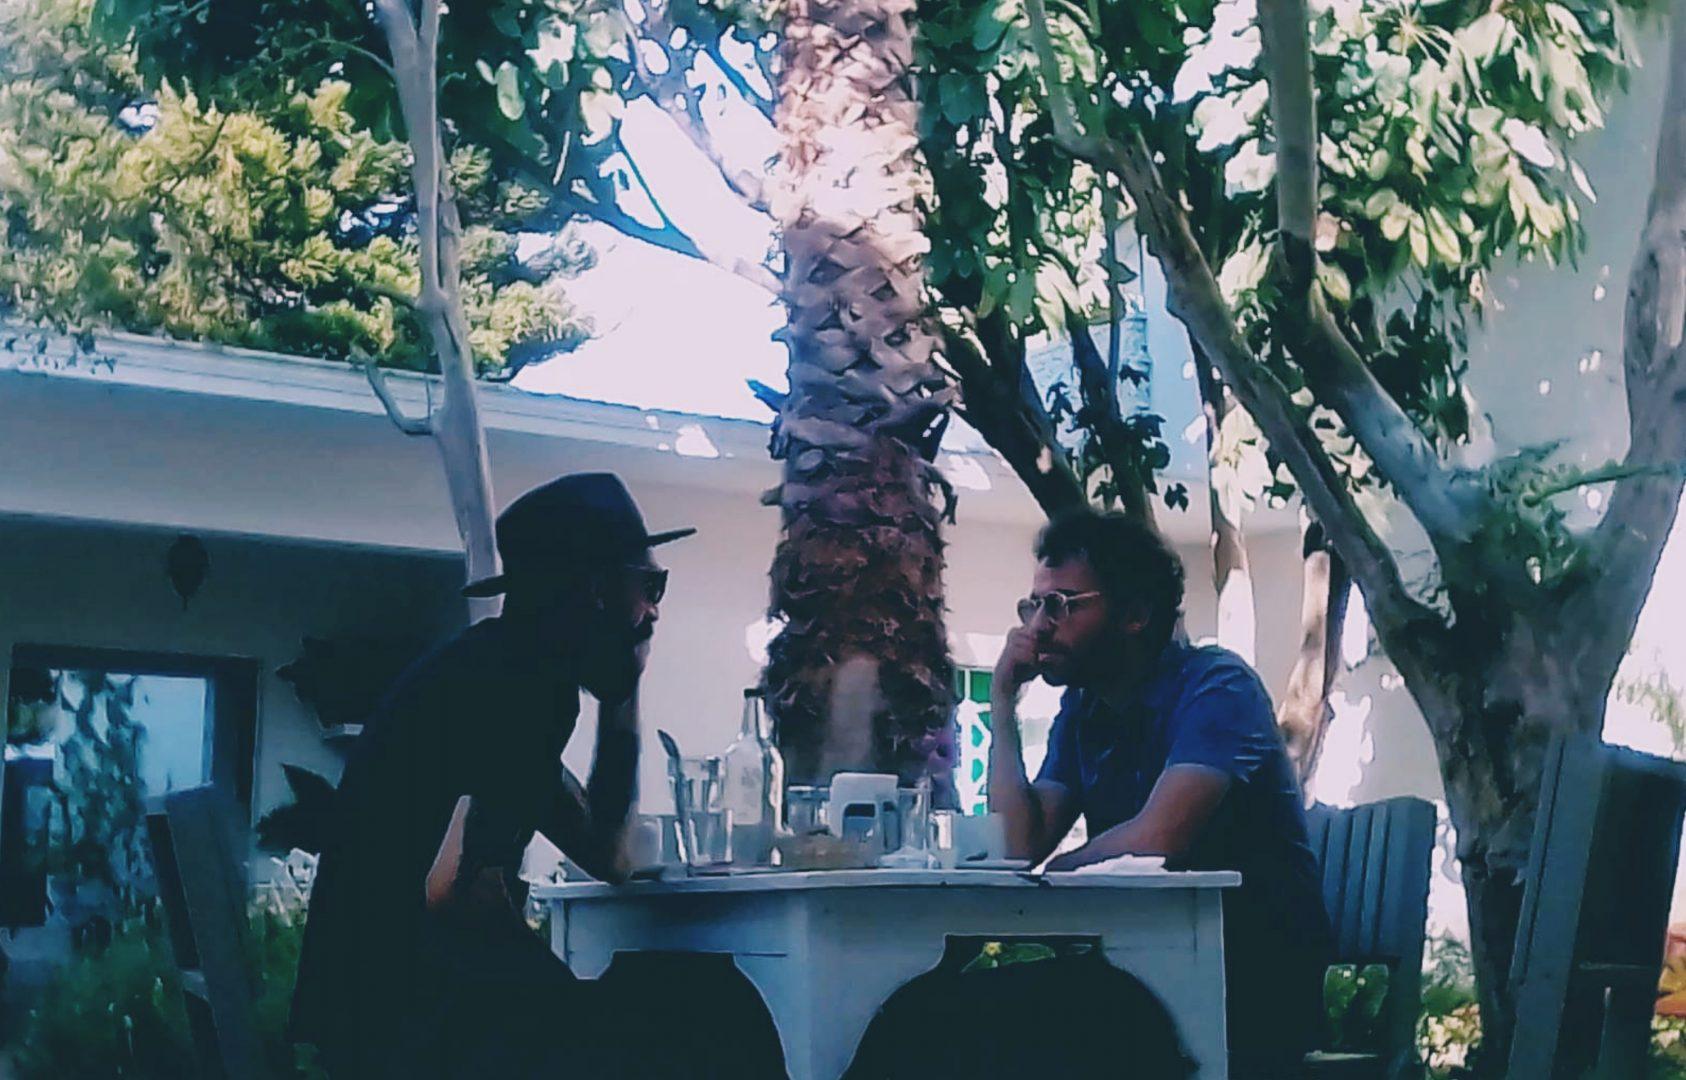 Rodrigo and LEMAT in conversation, photo by Hanna